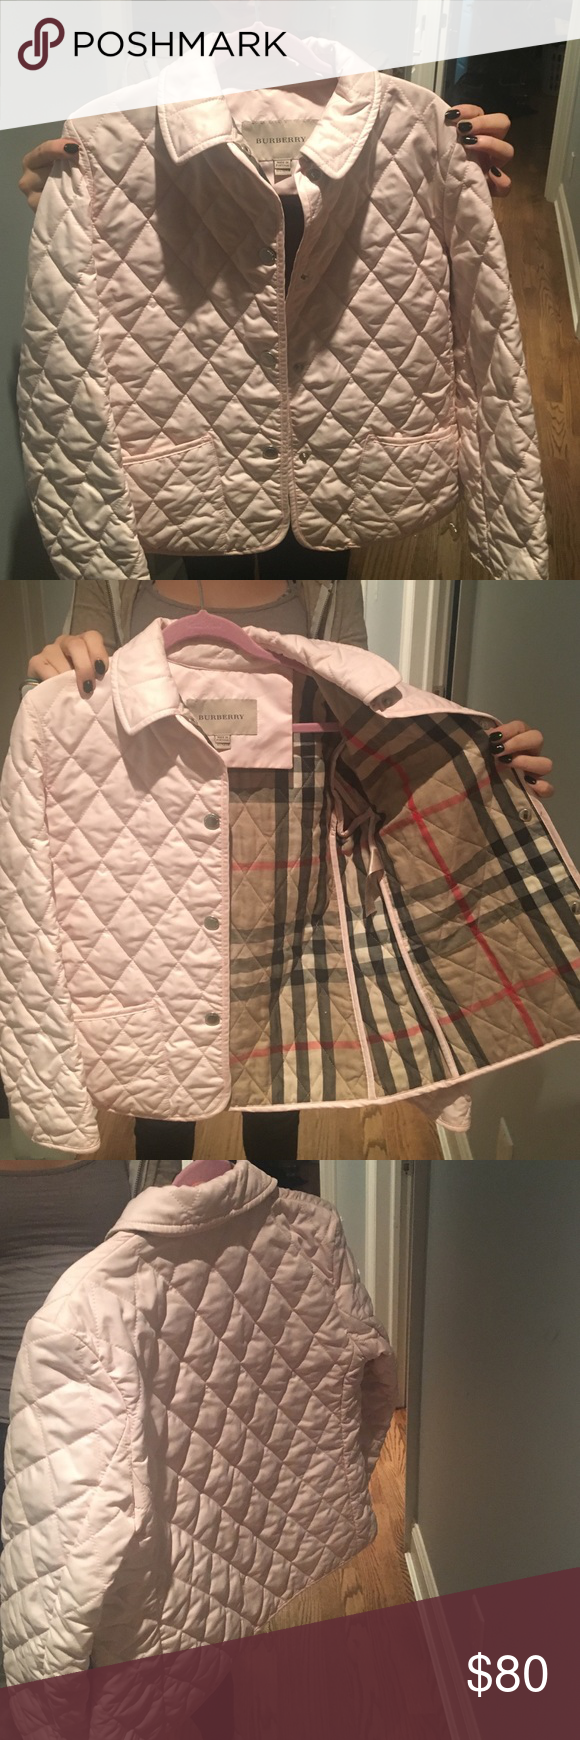 Girls Burberry jacket worn once Girls pink Burberry jacket..brand new size 10 Burberry Jackets & Coats